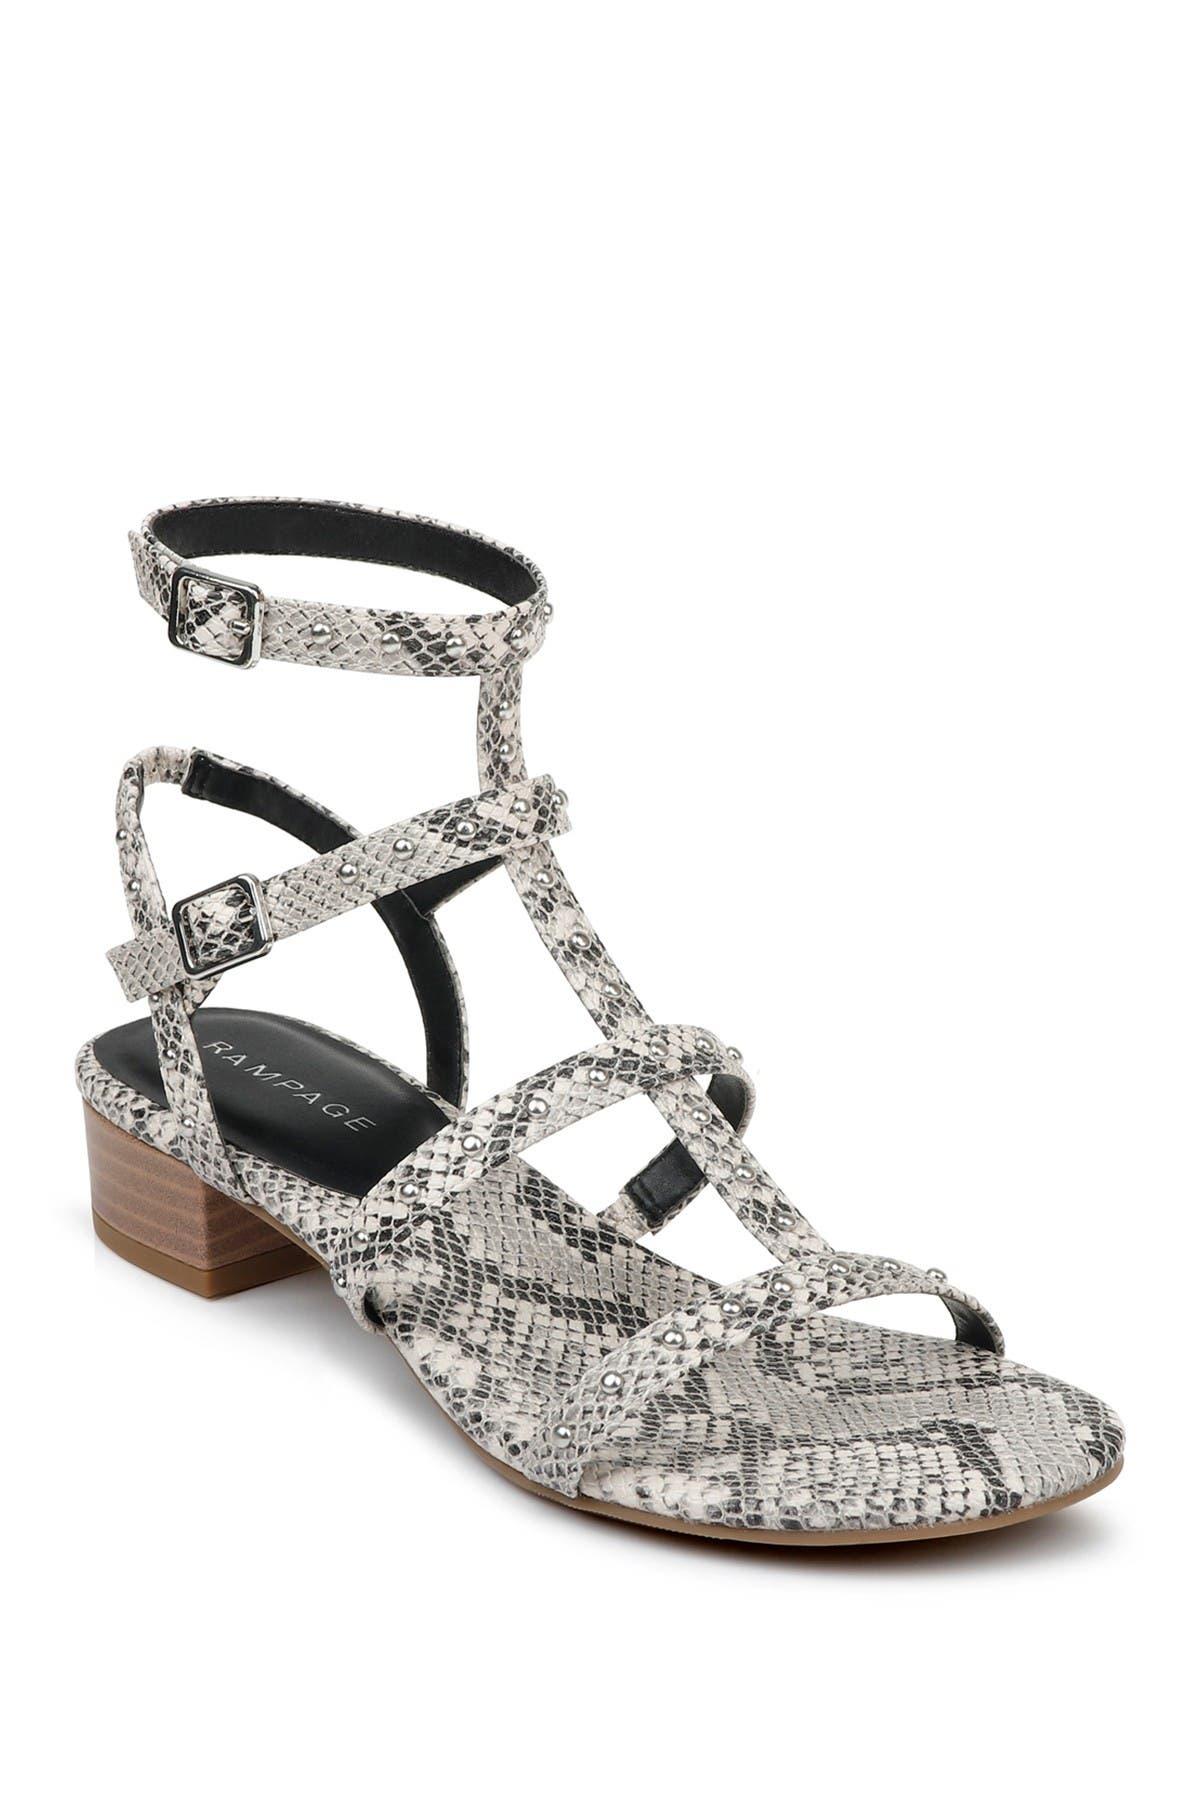 Image of Rampage Carina Strappy Block Heel Sandal